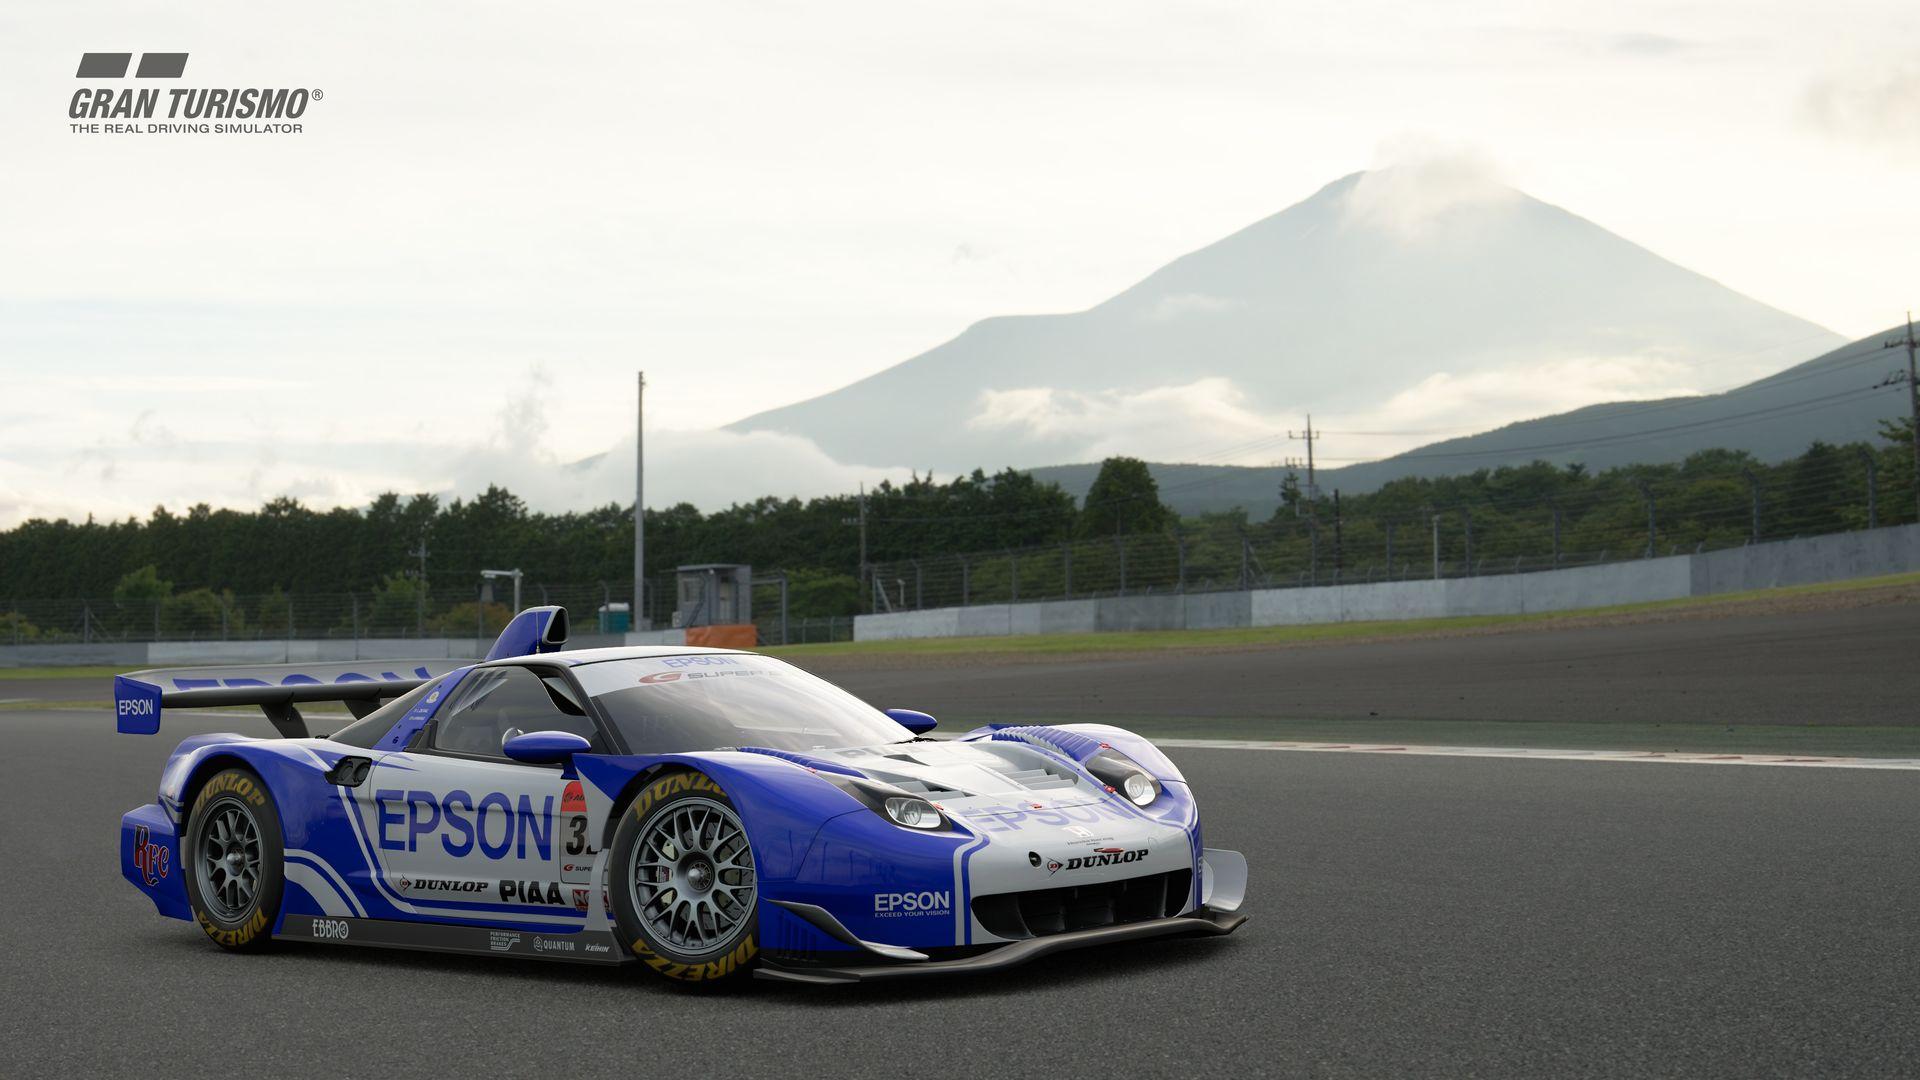 Gran Turismo Sport November Update Honda EPSON NSX '08 (Gr.2) 3